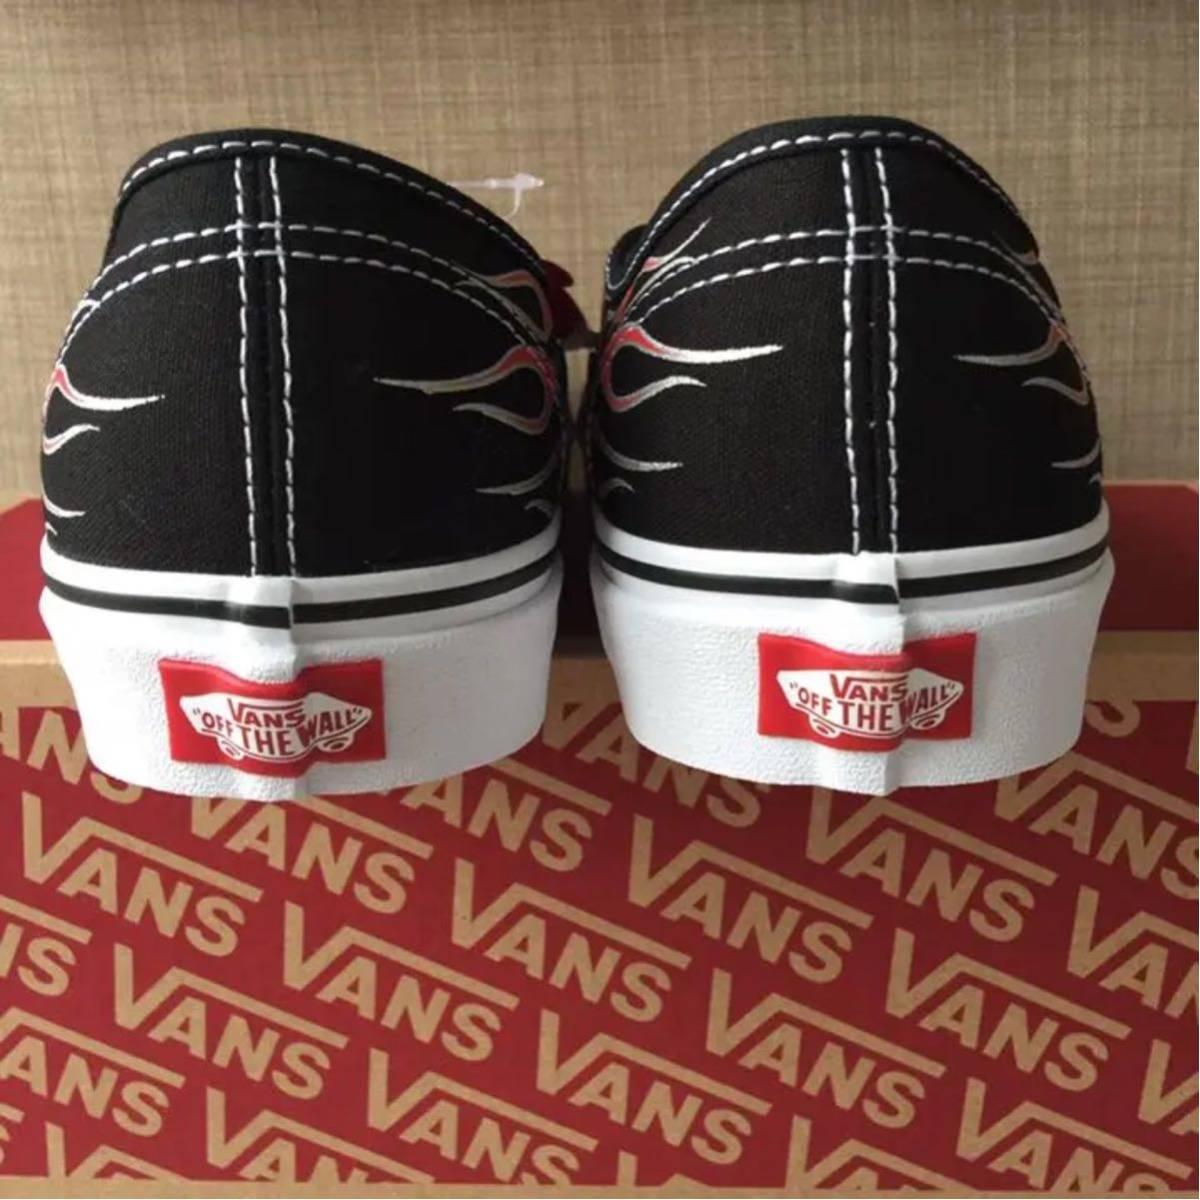 VANS フレイムス ファイヤーパターン 靴 スニーカー ヴァンズ ホットロッド USDM JDM ハーレー トラック ピンスト アメカジ ストリート